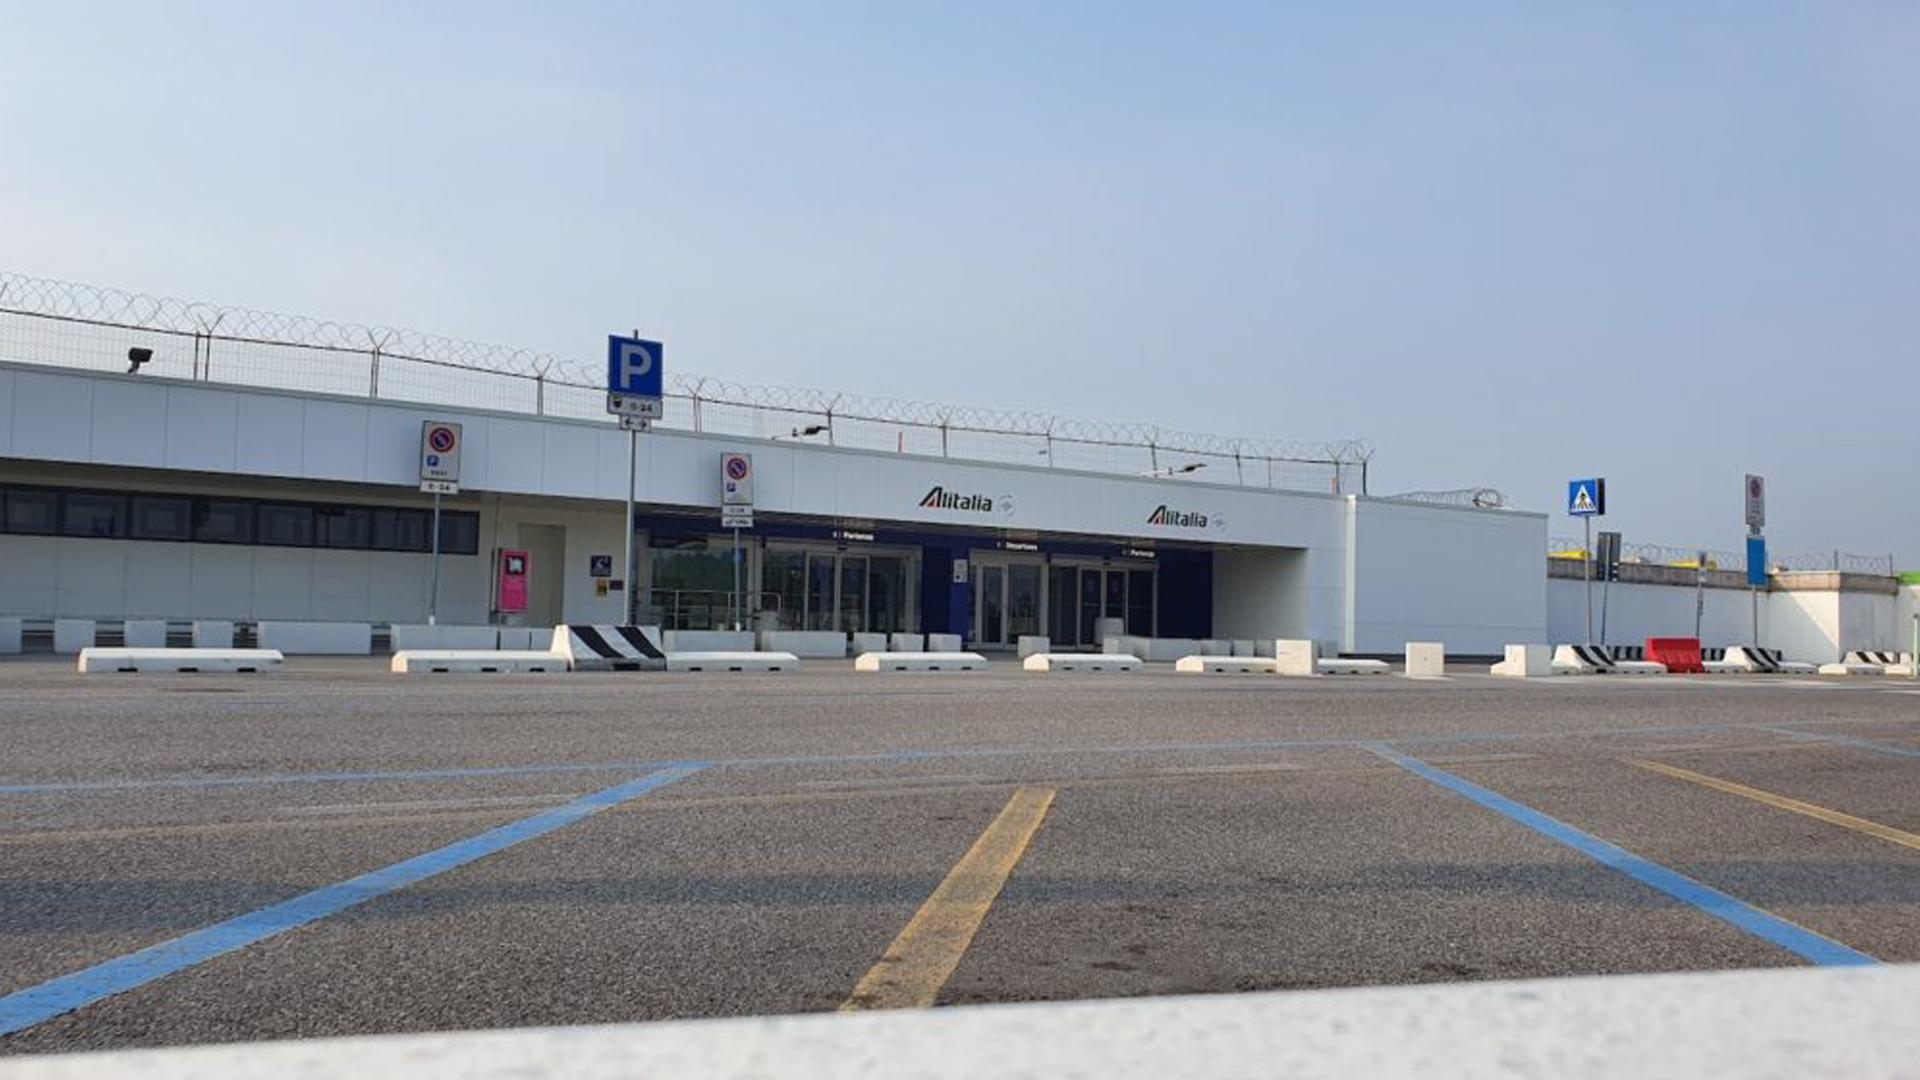 Aeroporto Linate - Coronavirus